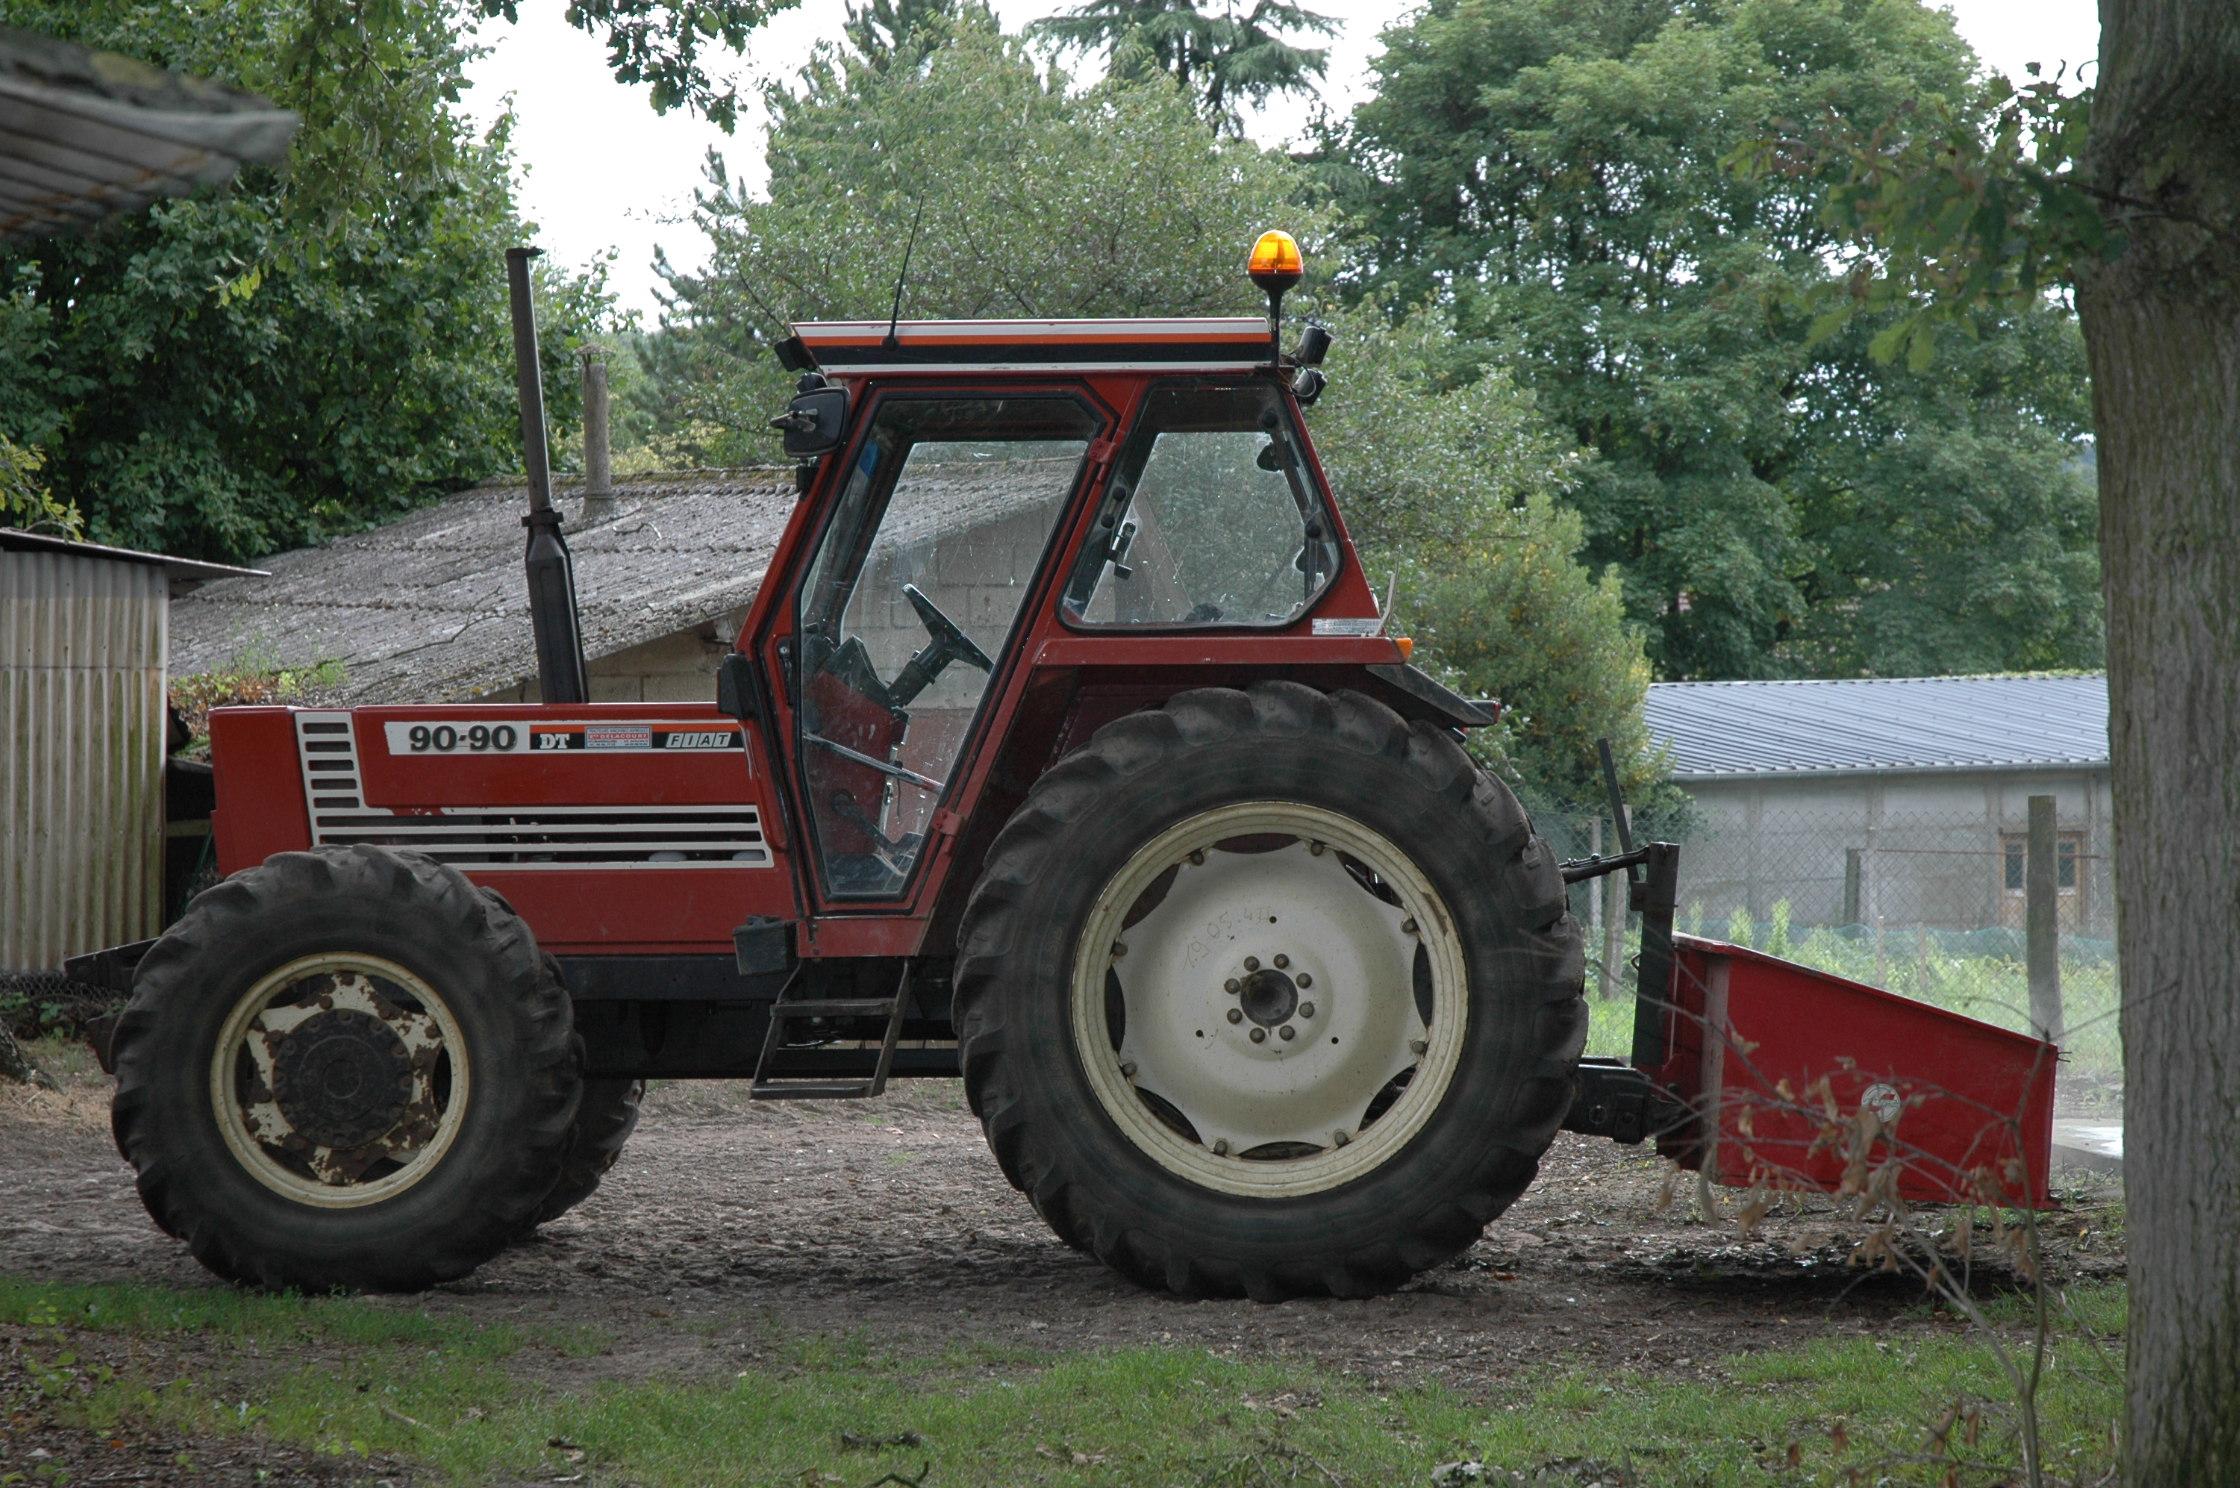 Archivo:Fiat 90-90 DT tractor 2005-08-07.jpg - Wikipedia, la ...